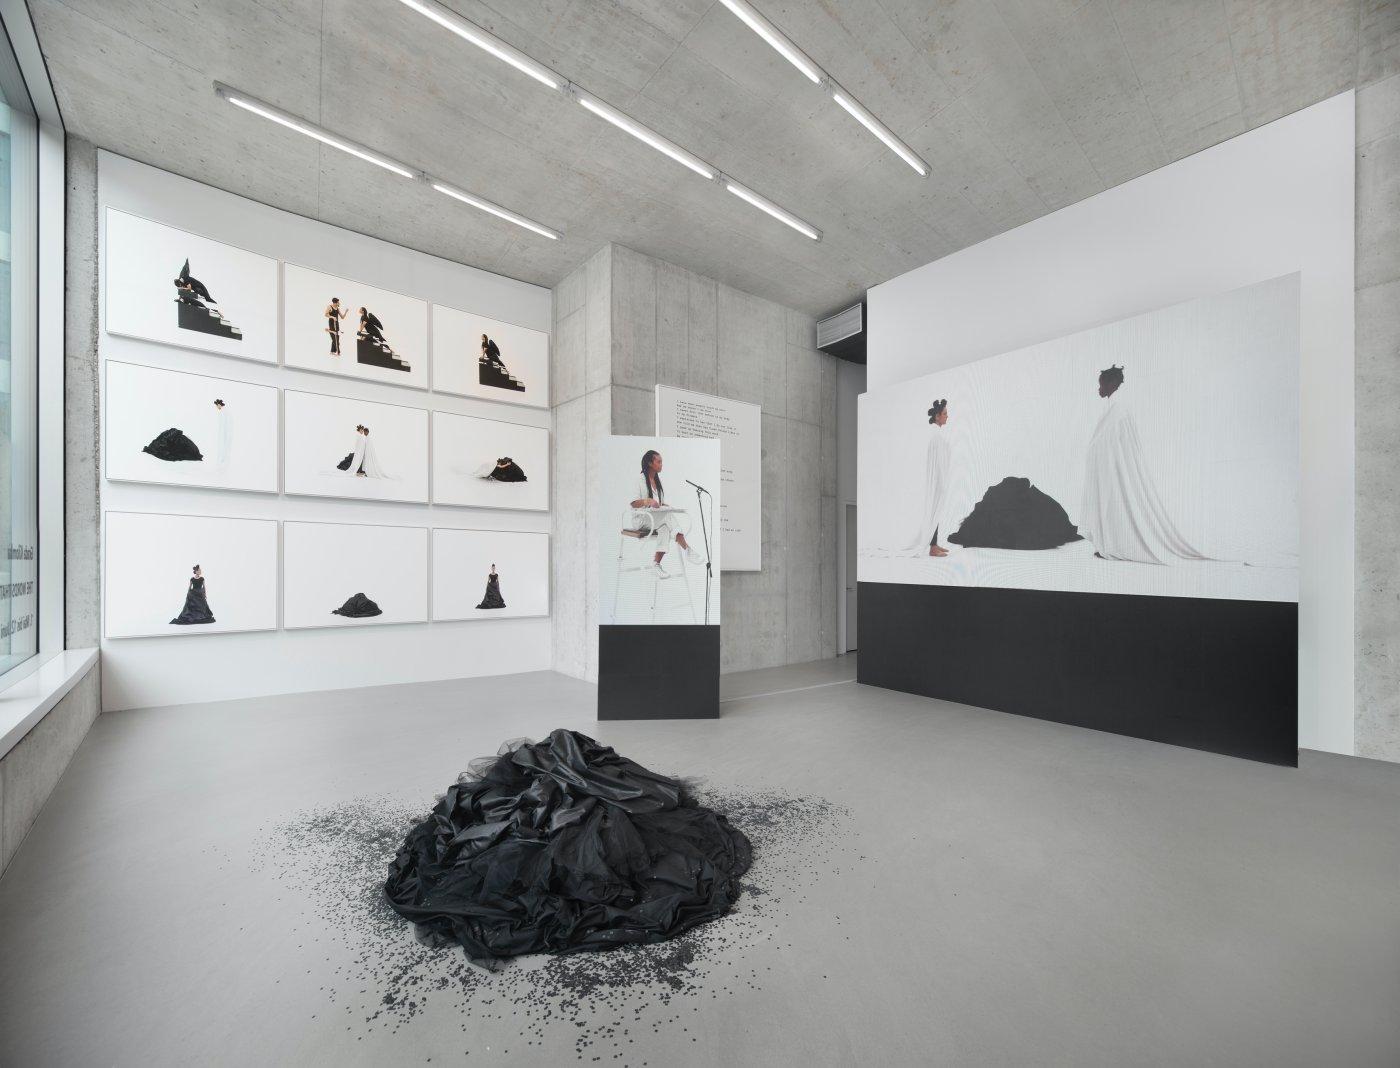 McLaughlin Gallery Grada Kilomba 2